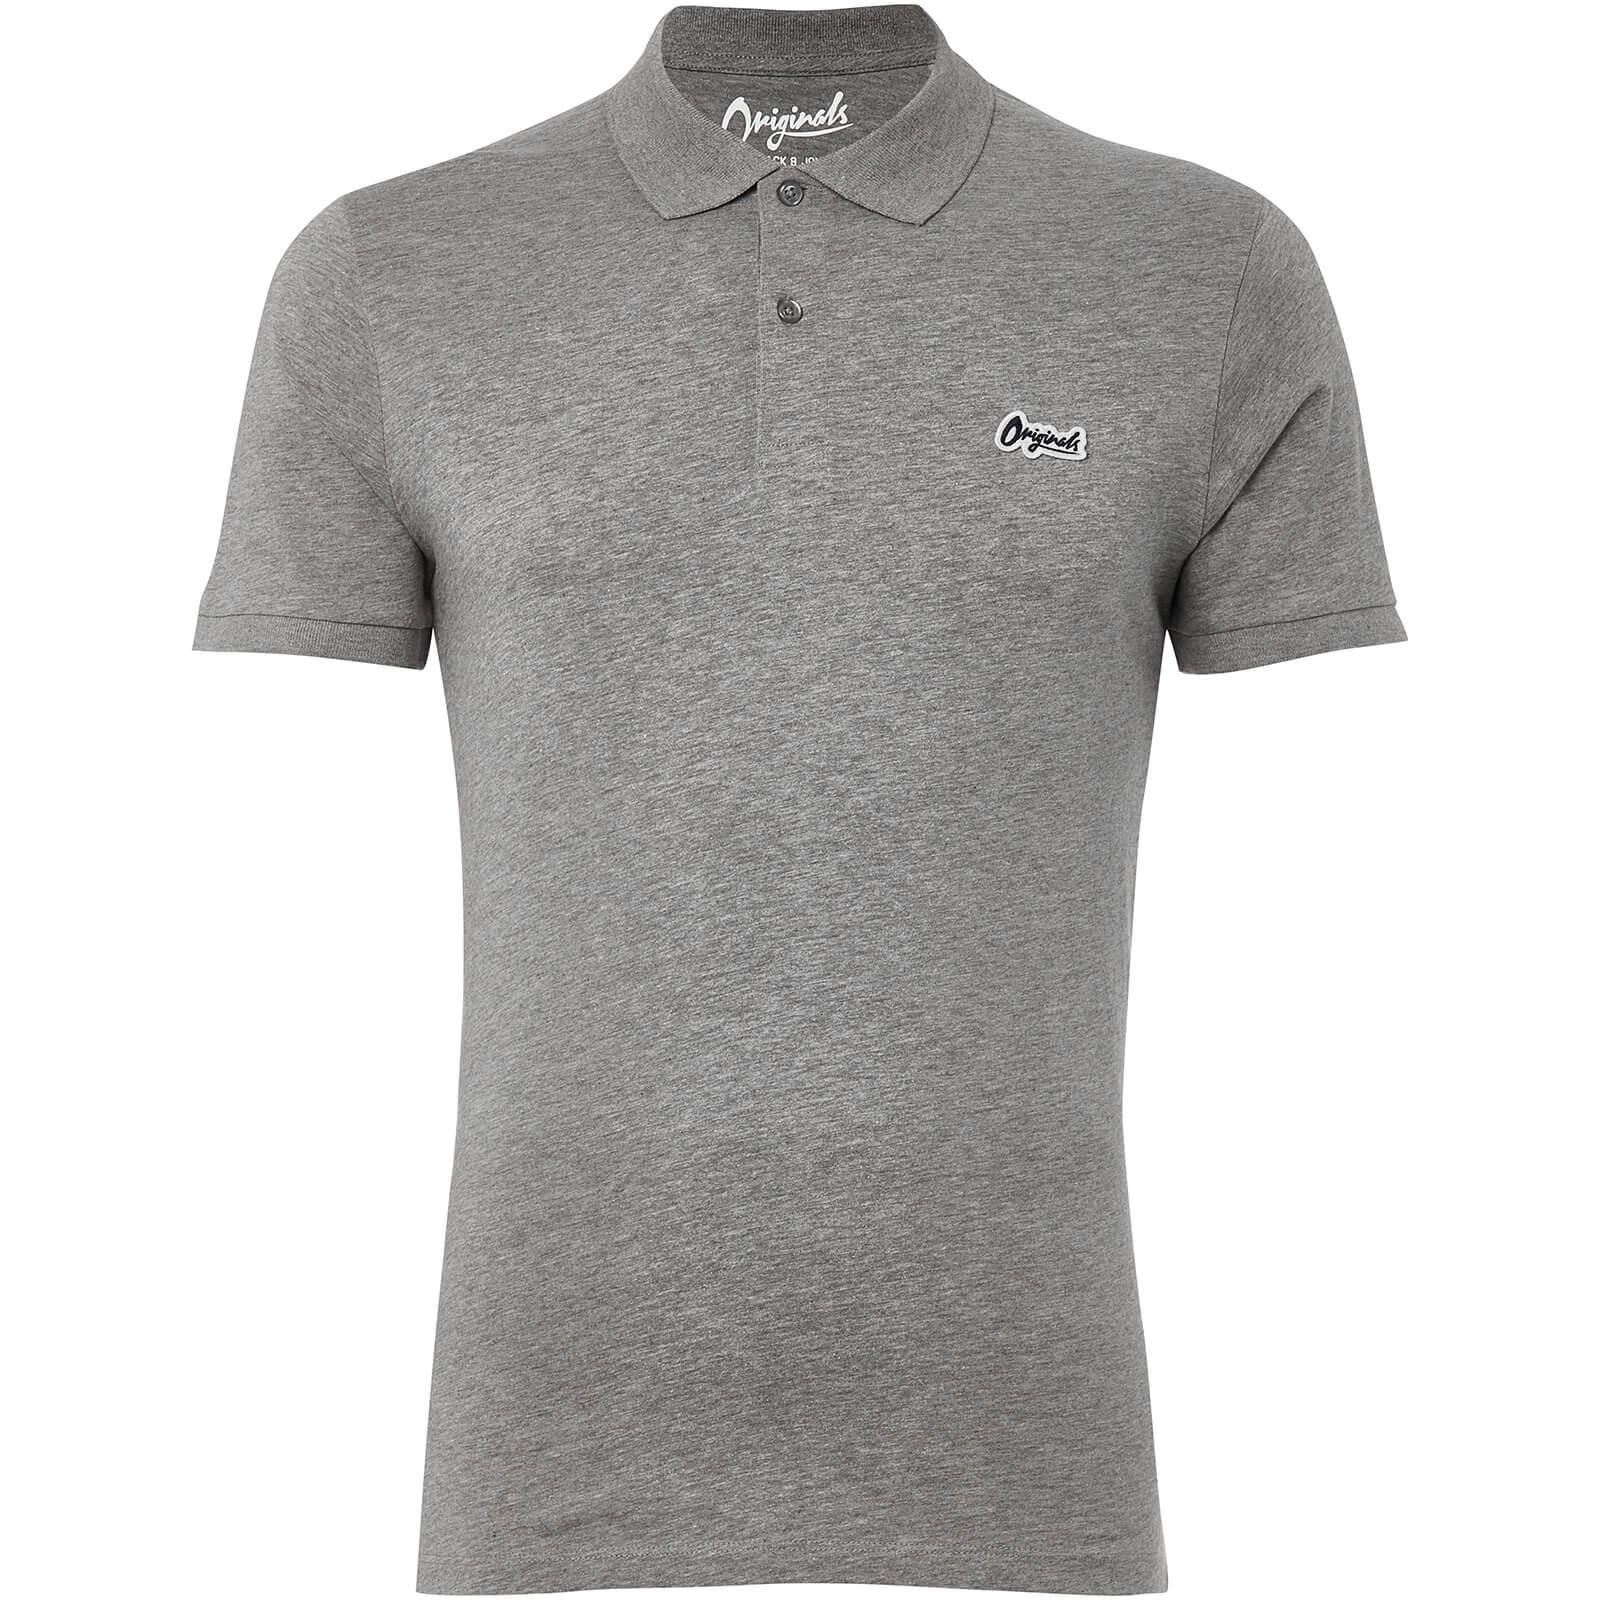 Jack   Jones Originals Men s Jet Jersey Polo Shirt - Light Grey Marl  Clothing  ec036eb429799